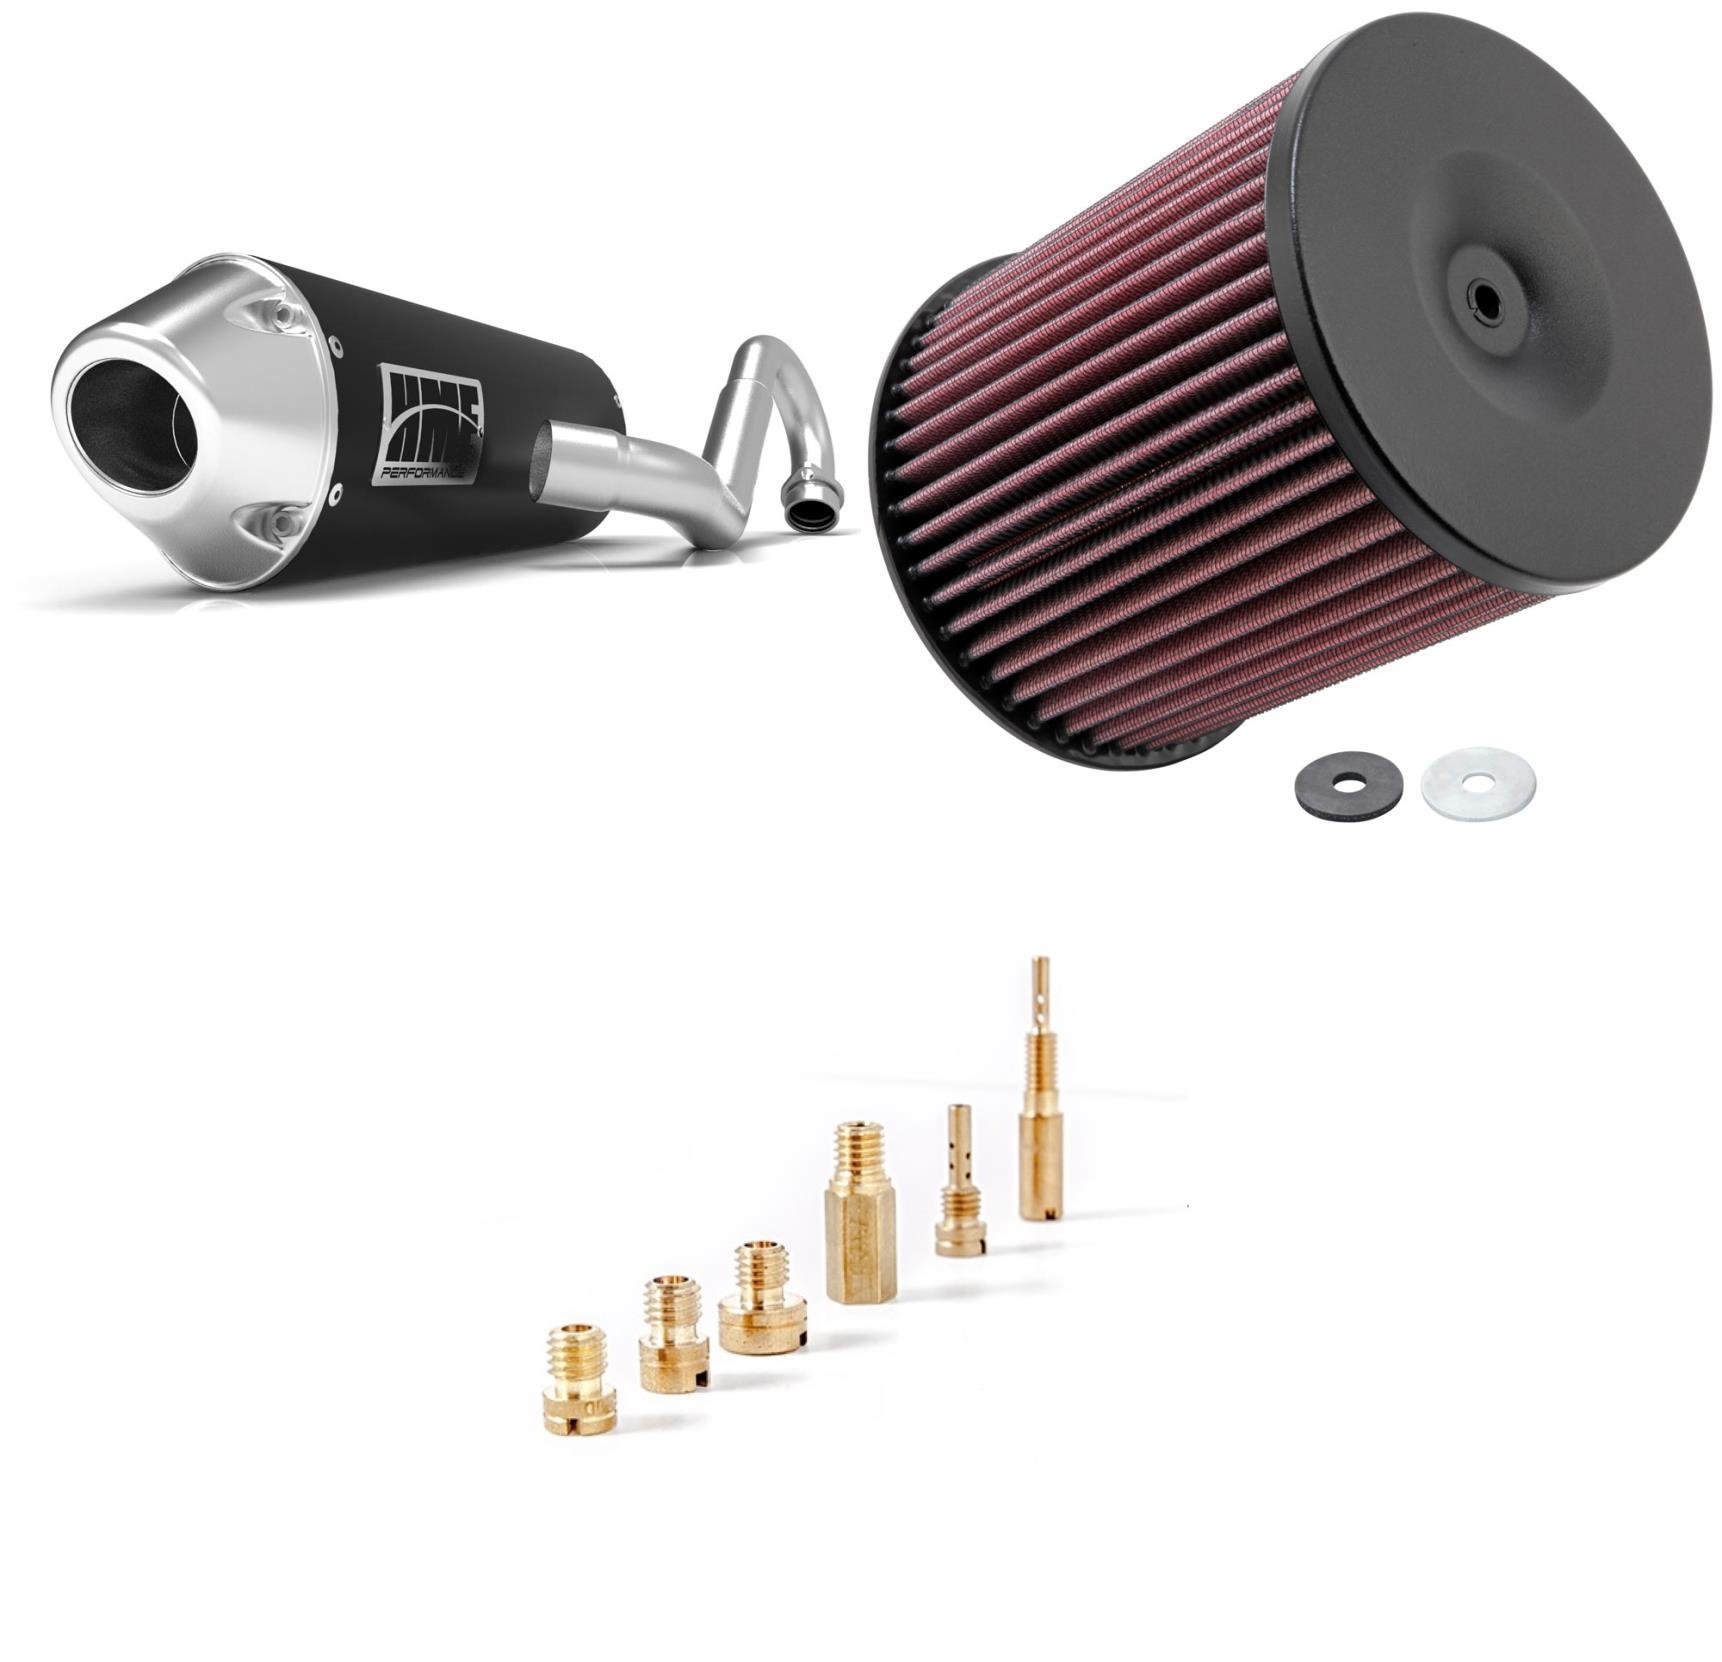 Basic Jet Kit, Air Filter & Black Performance-Series Full System Exhaust Euro-Polished for Yamaha YFZ 450 2012